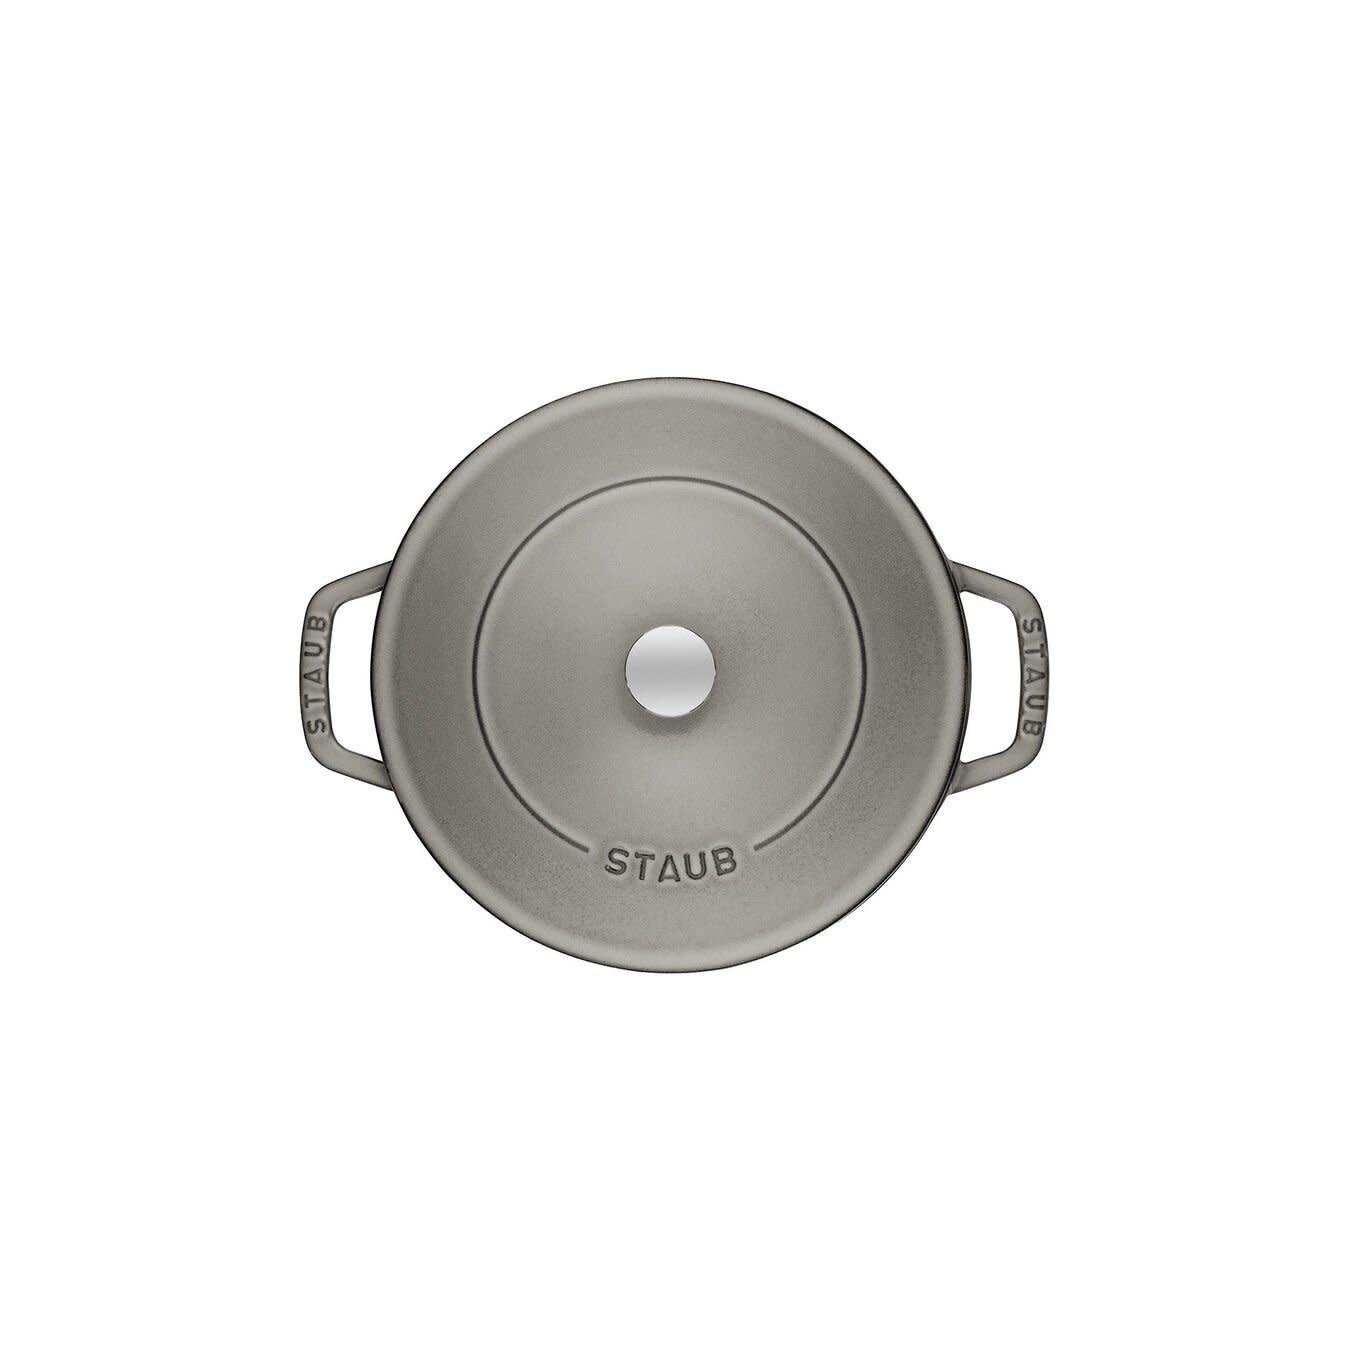 Staub 4qt Chistera Braiser - Grey 3.8L 28cm Base